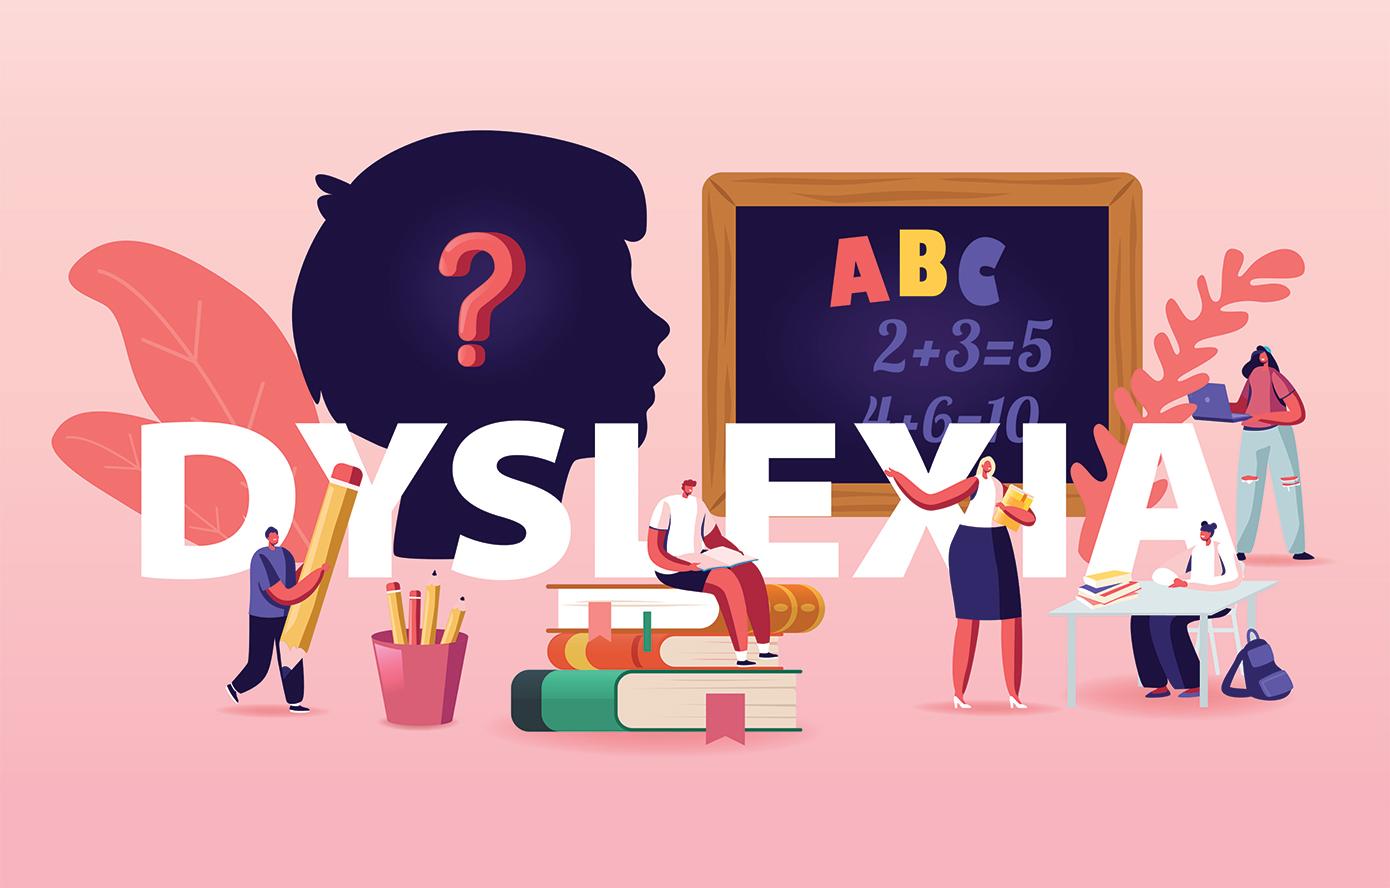 dyslexia, illustrated profile of child's head, blackboard, books, man holding giant pencil, teacher